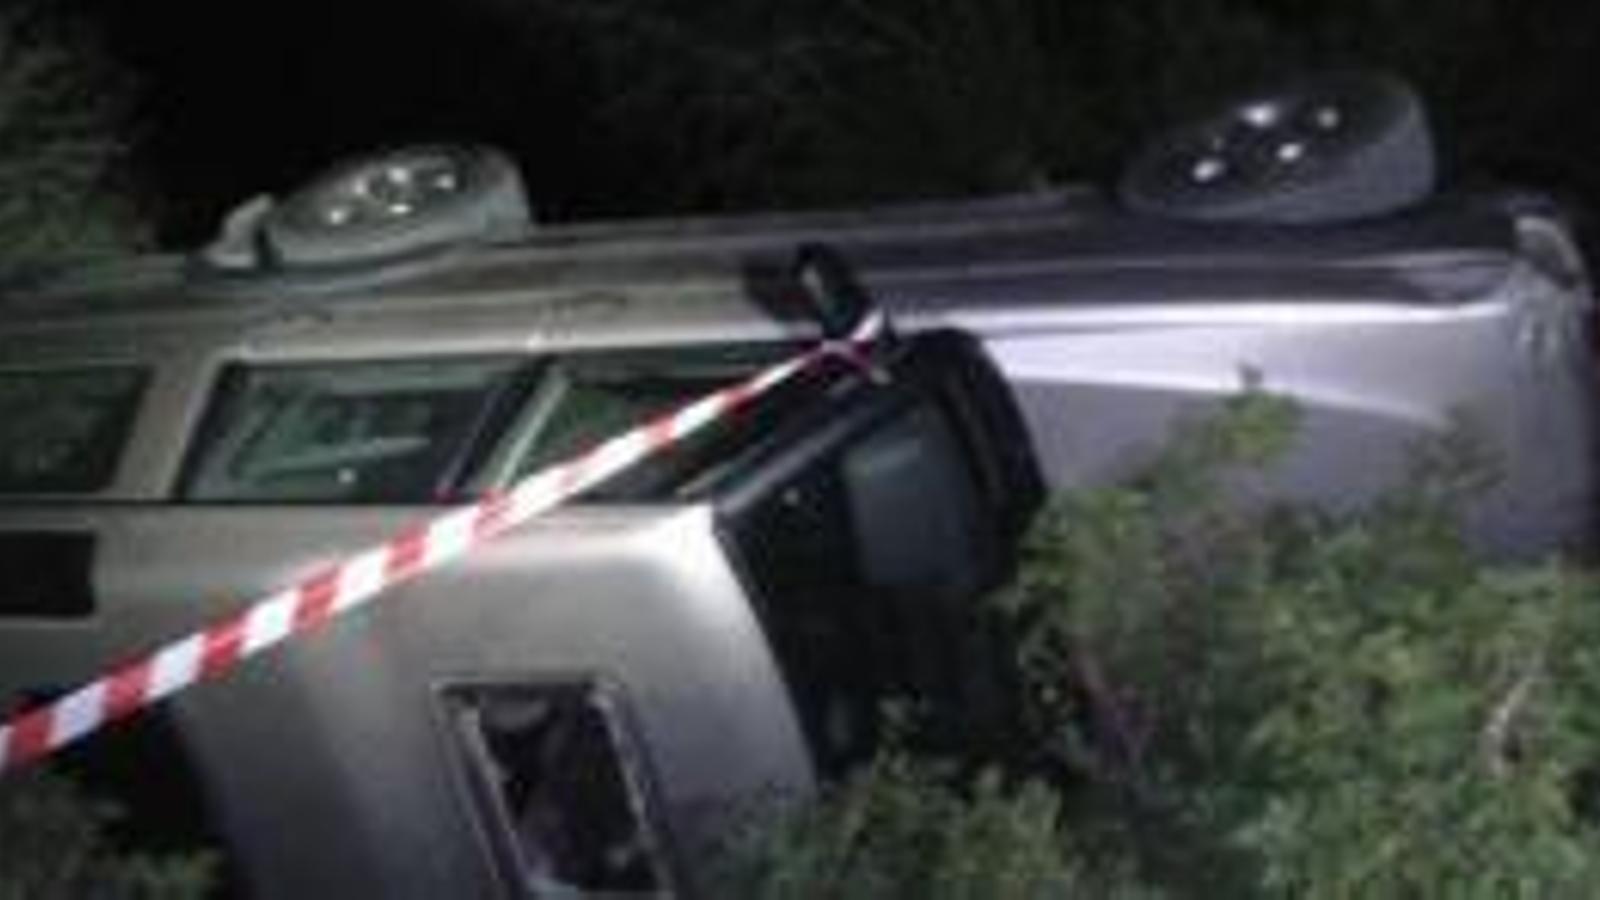 Imatge del vehicle sinistrat